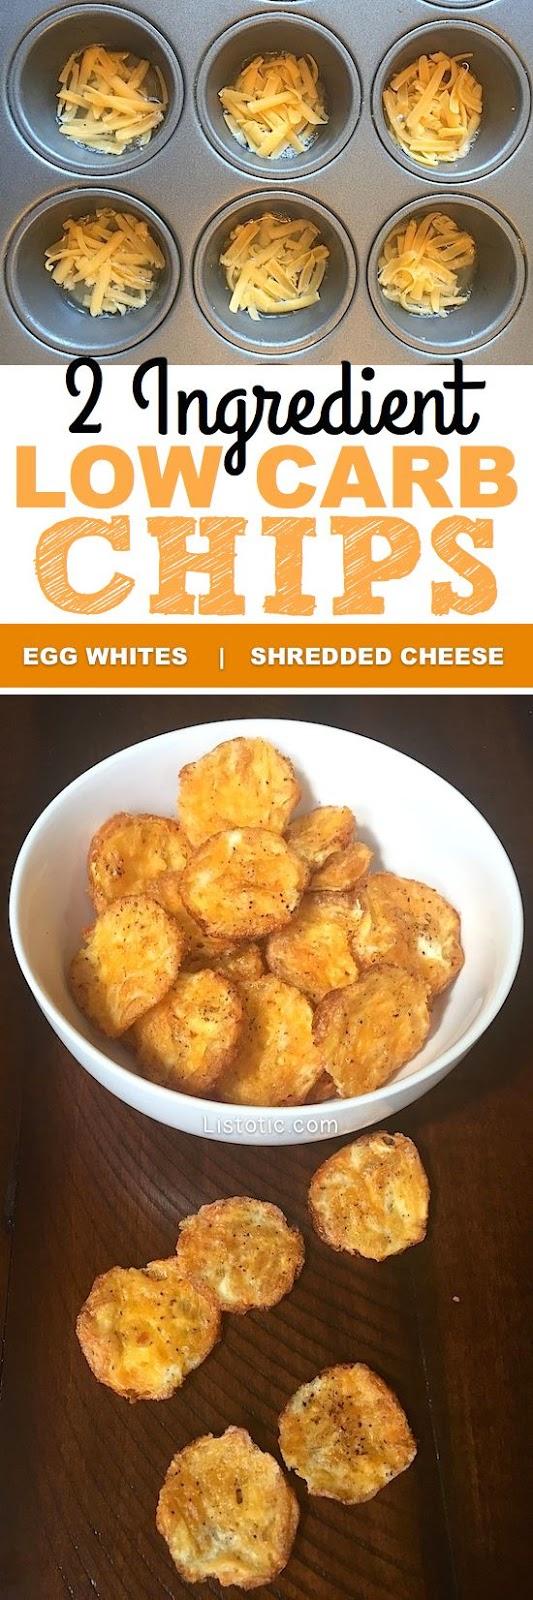 2 Ingredient Low Carb Chips